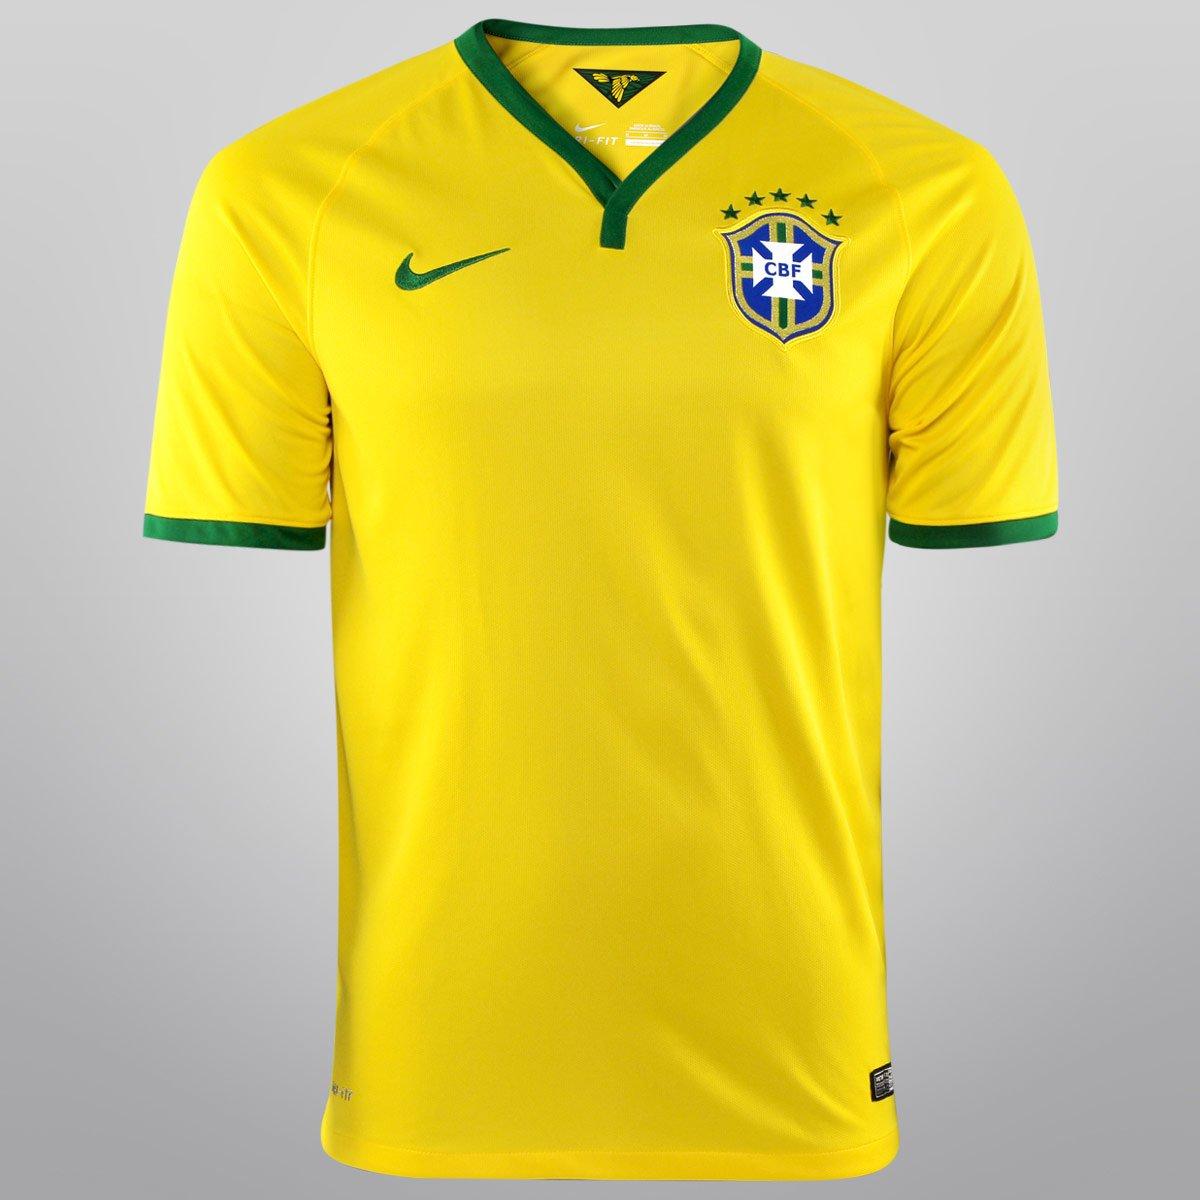 Camisa Nike Seleção Brasil I 14 15 s nº - Torcedor - Compre Agora ... ea4a87baa62